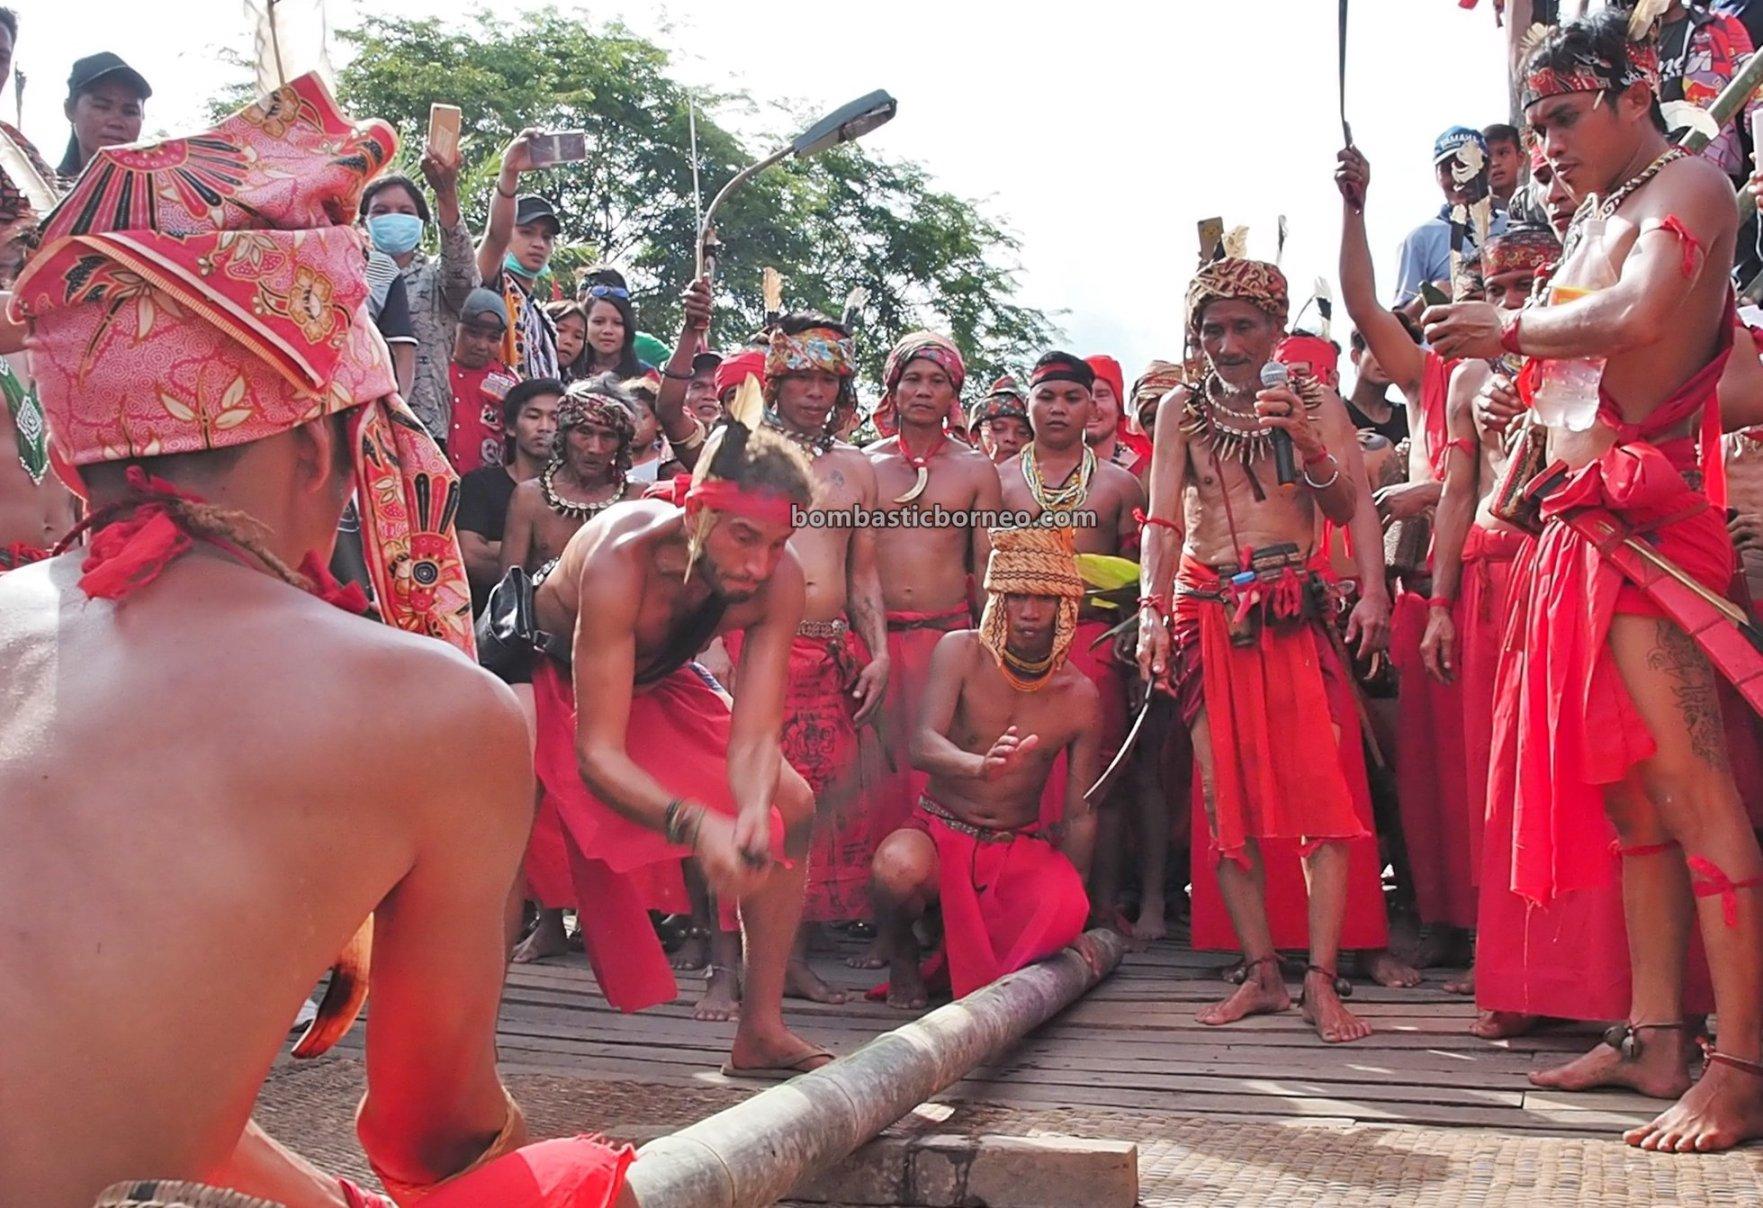 Nyobeng Sebujit, Gawai Harvest Festival, traditional, Destination, Bengkayang, Indonesia, Kalimantan Barat, Indigenous, native, tribe, wisata budaya, Tourism, travel guide, bamboo chopping, Trans Borneo, 探索原住民传统文化